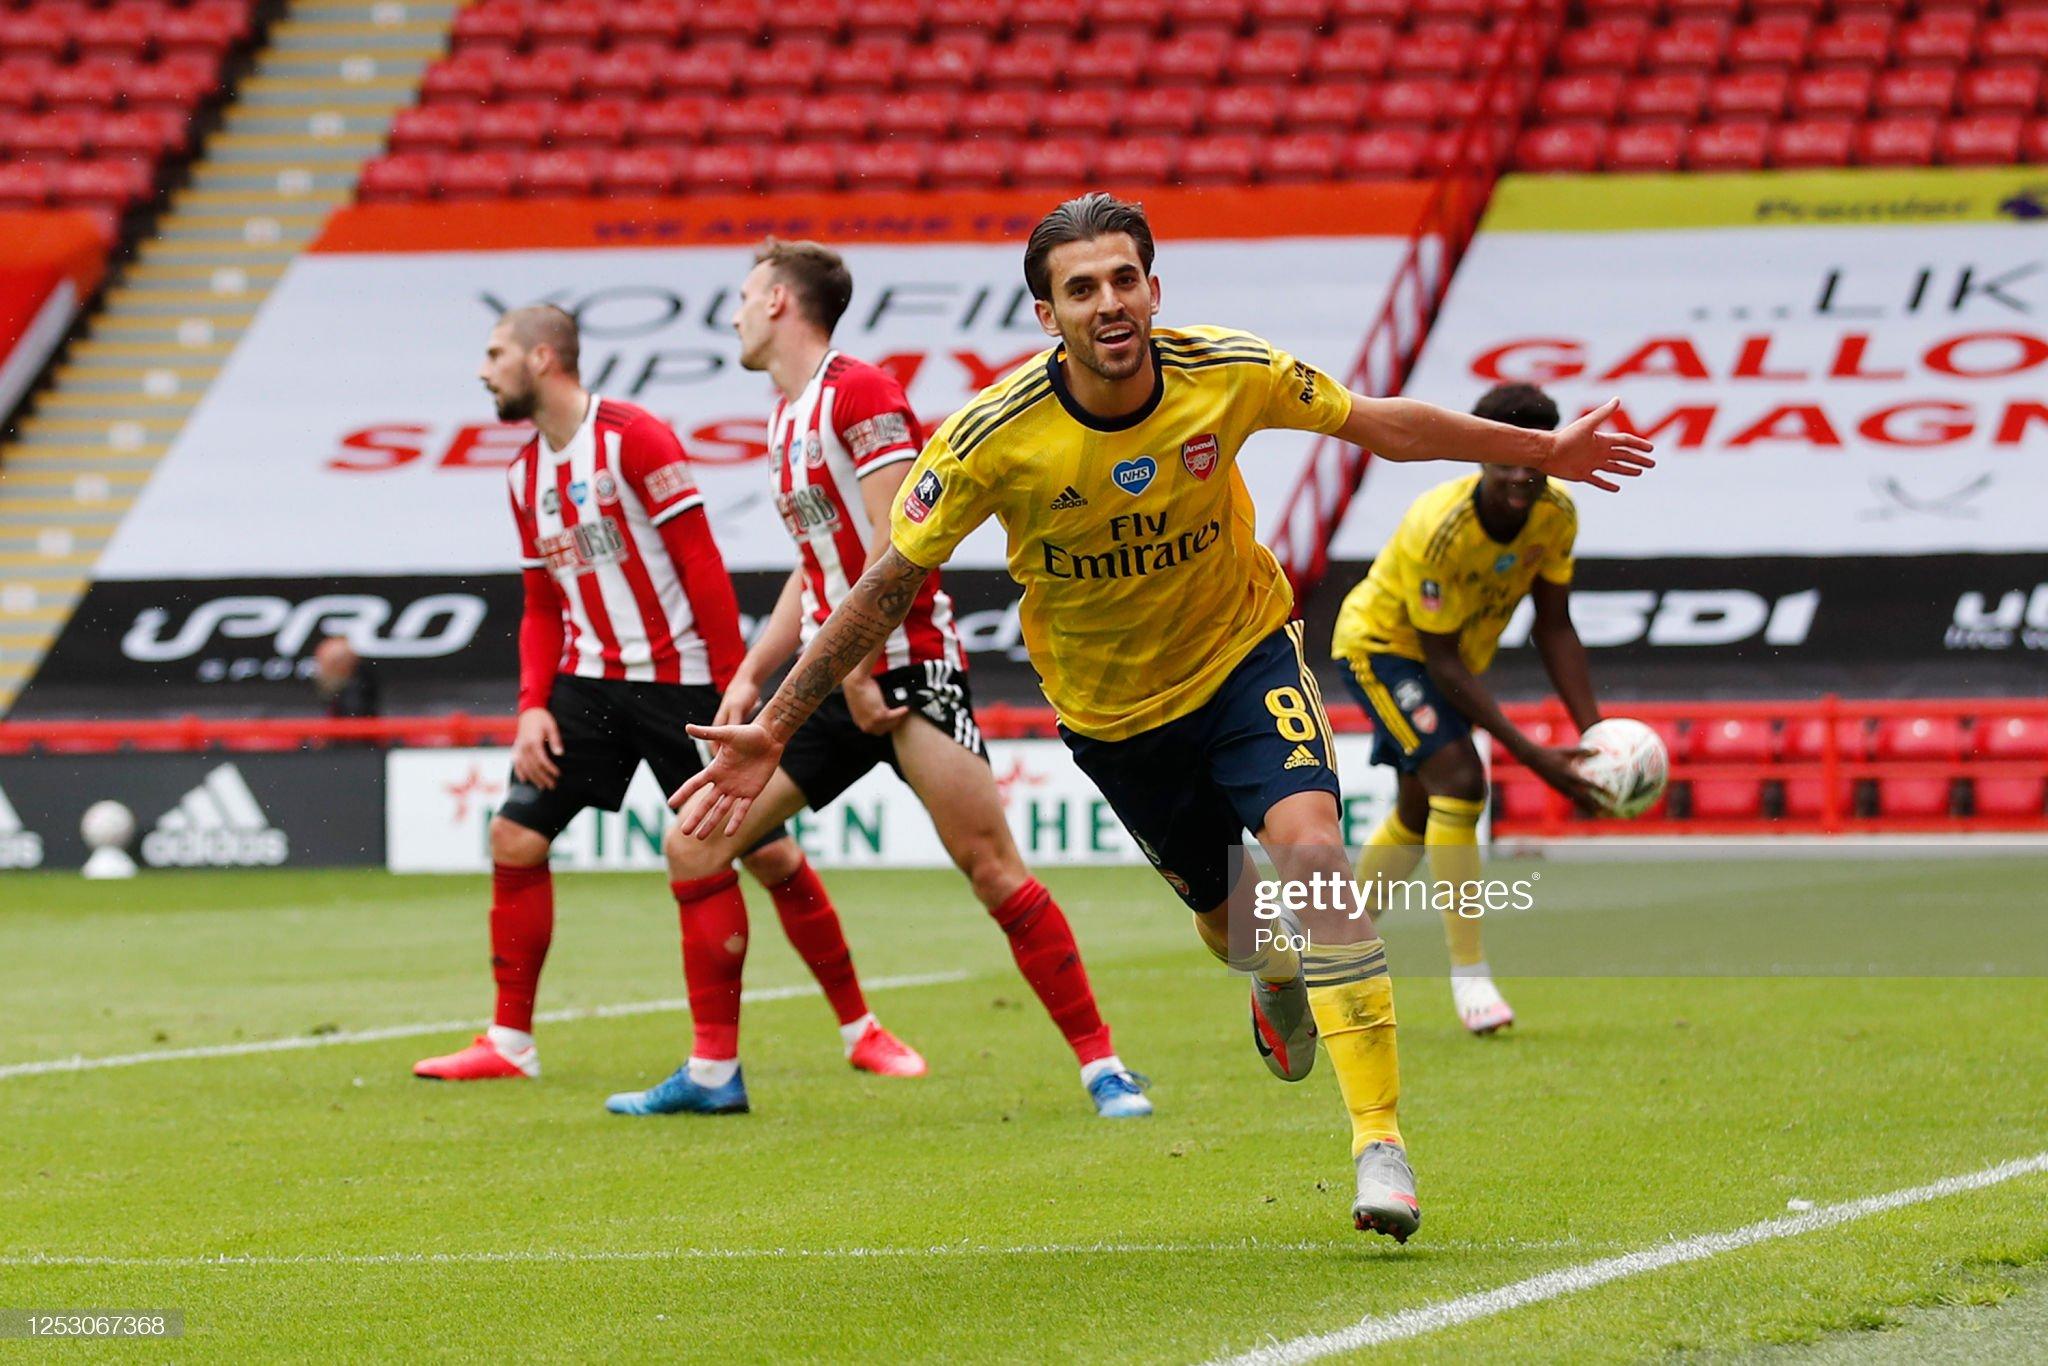 Sheffield United v Arsenal - FA Cup: Quarter Final : News Photo